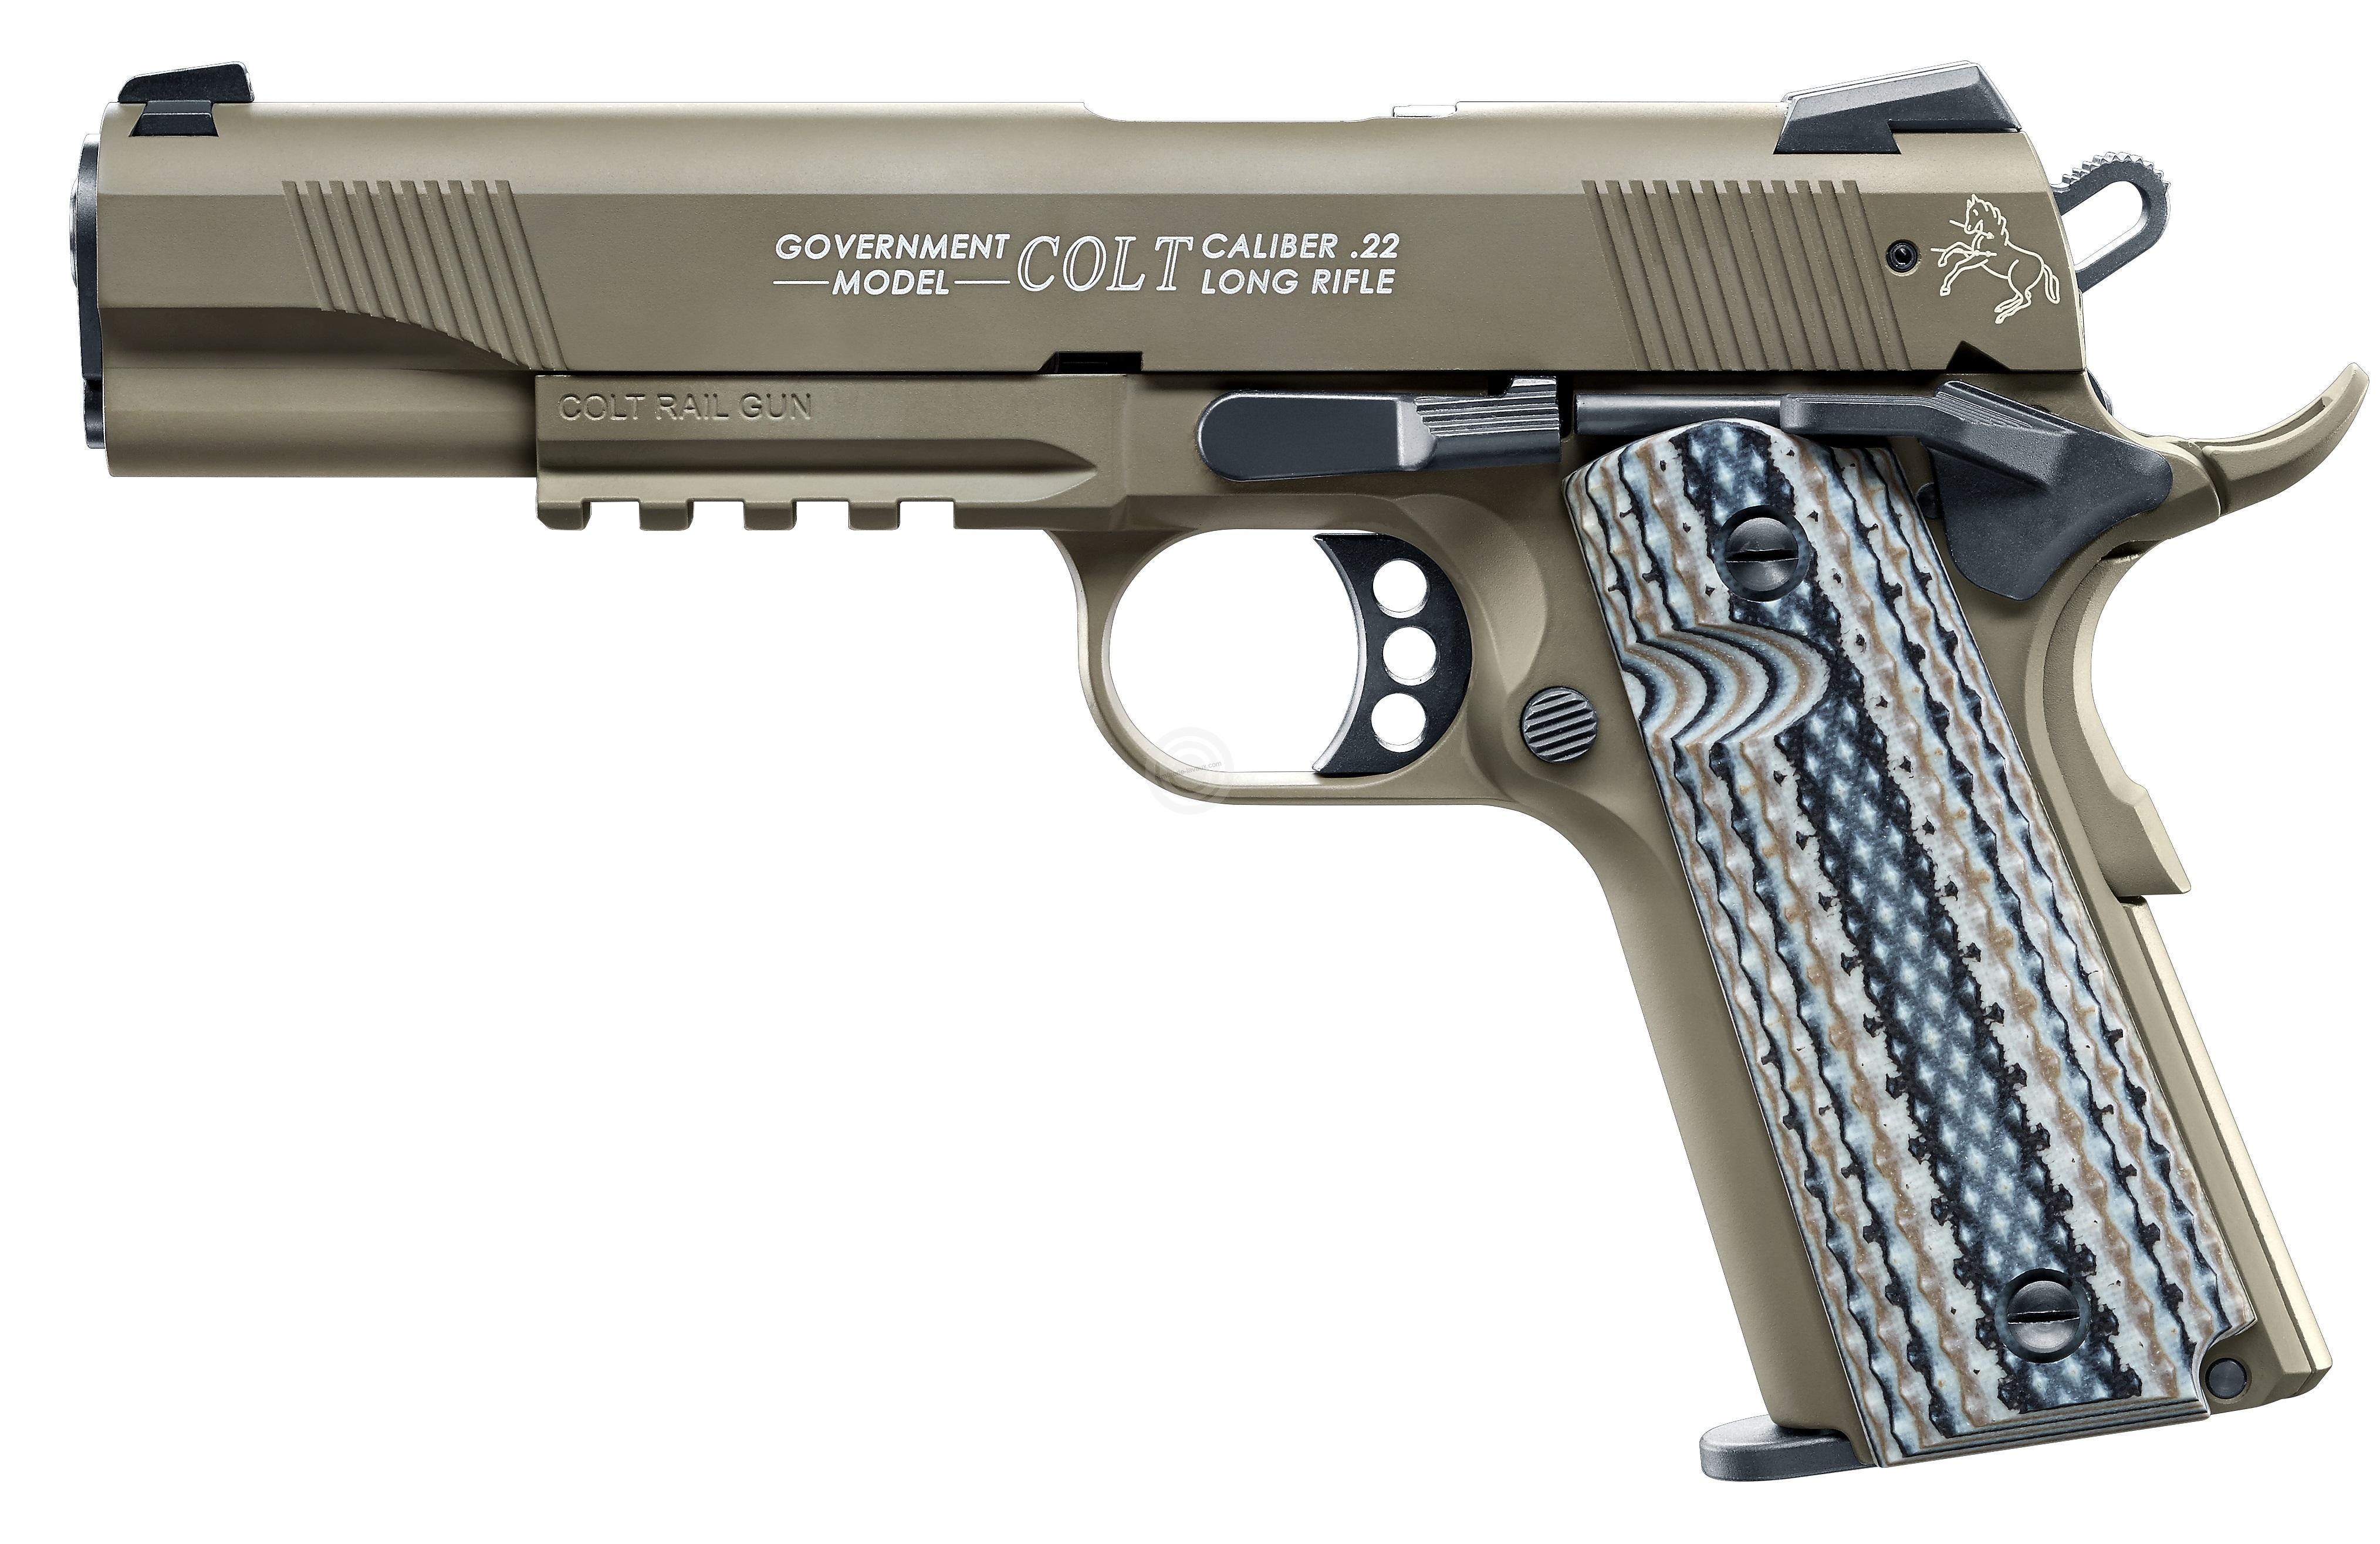 Pistolet WALTHER COLT 1911 Rail Gun FDE cal.22 Lr